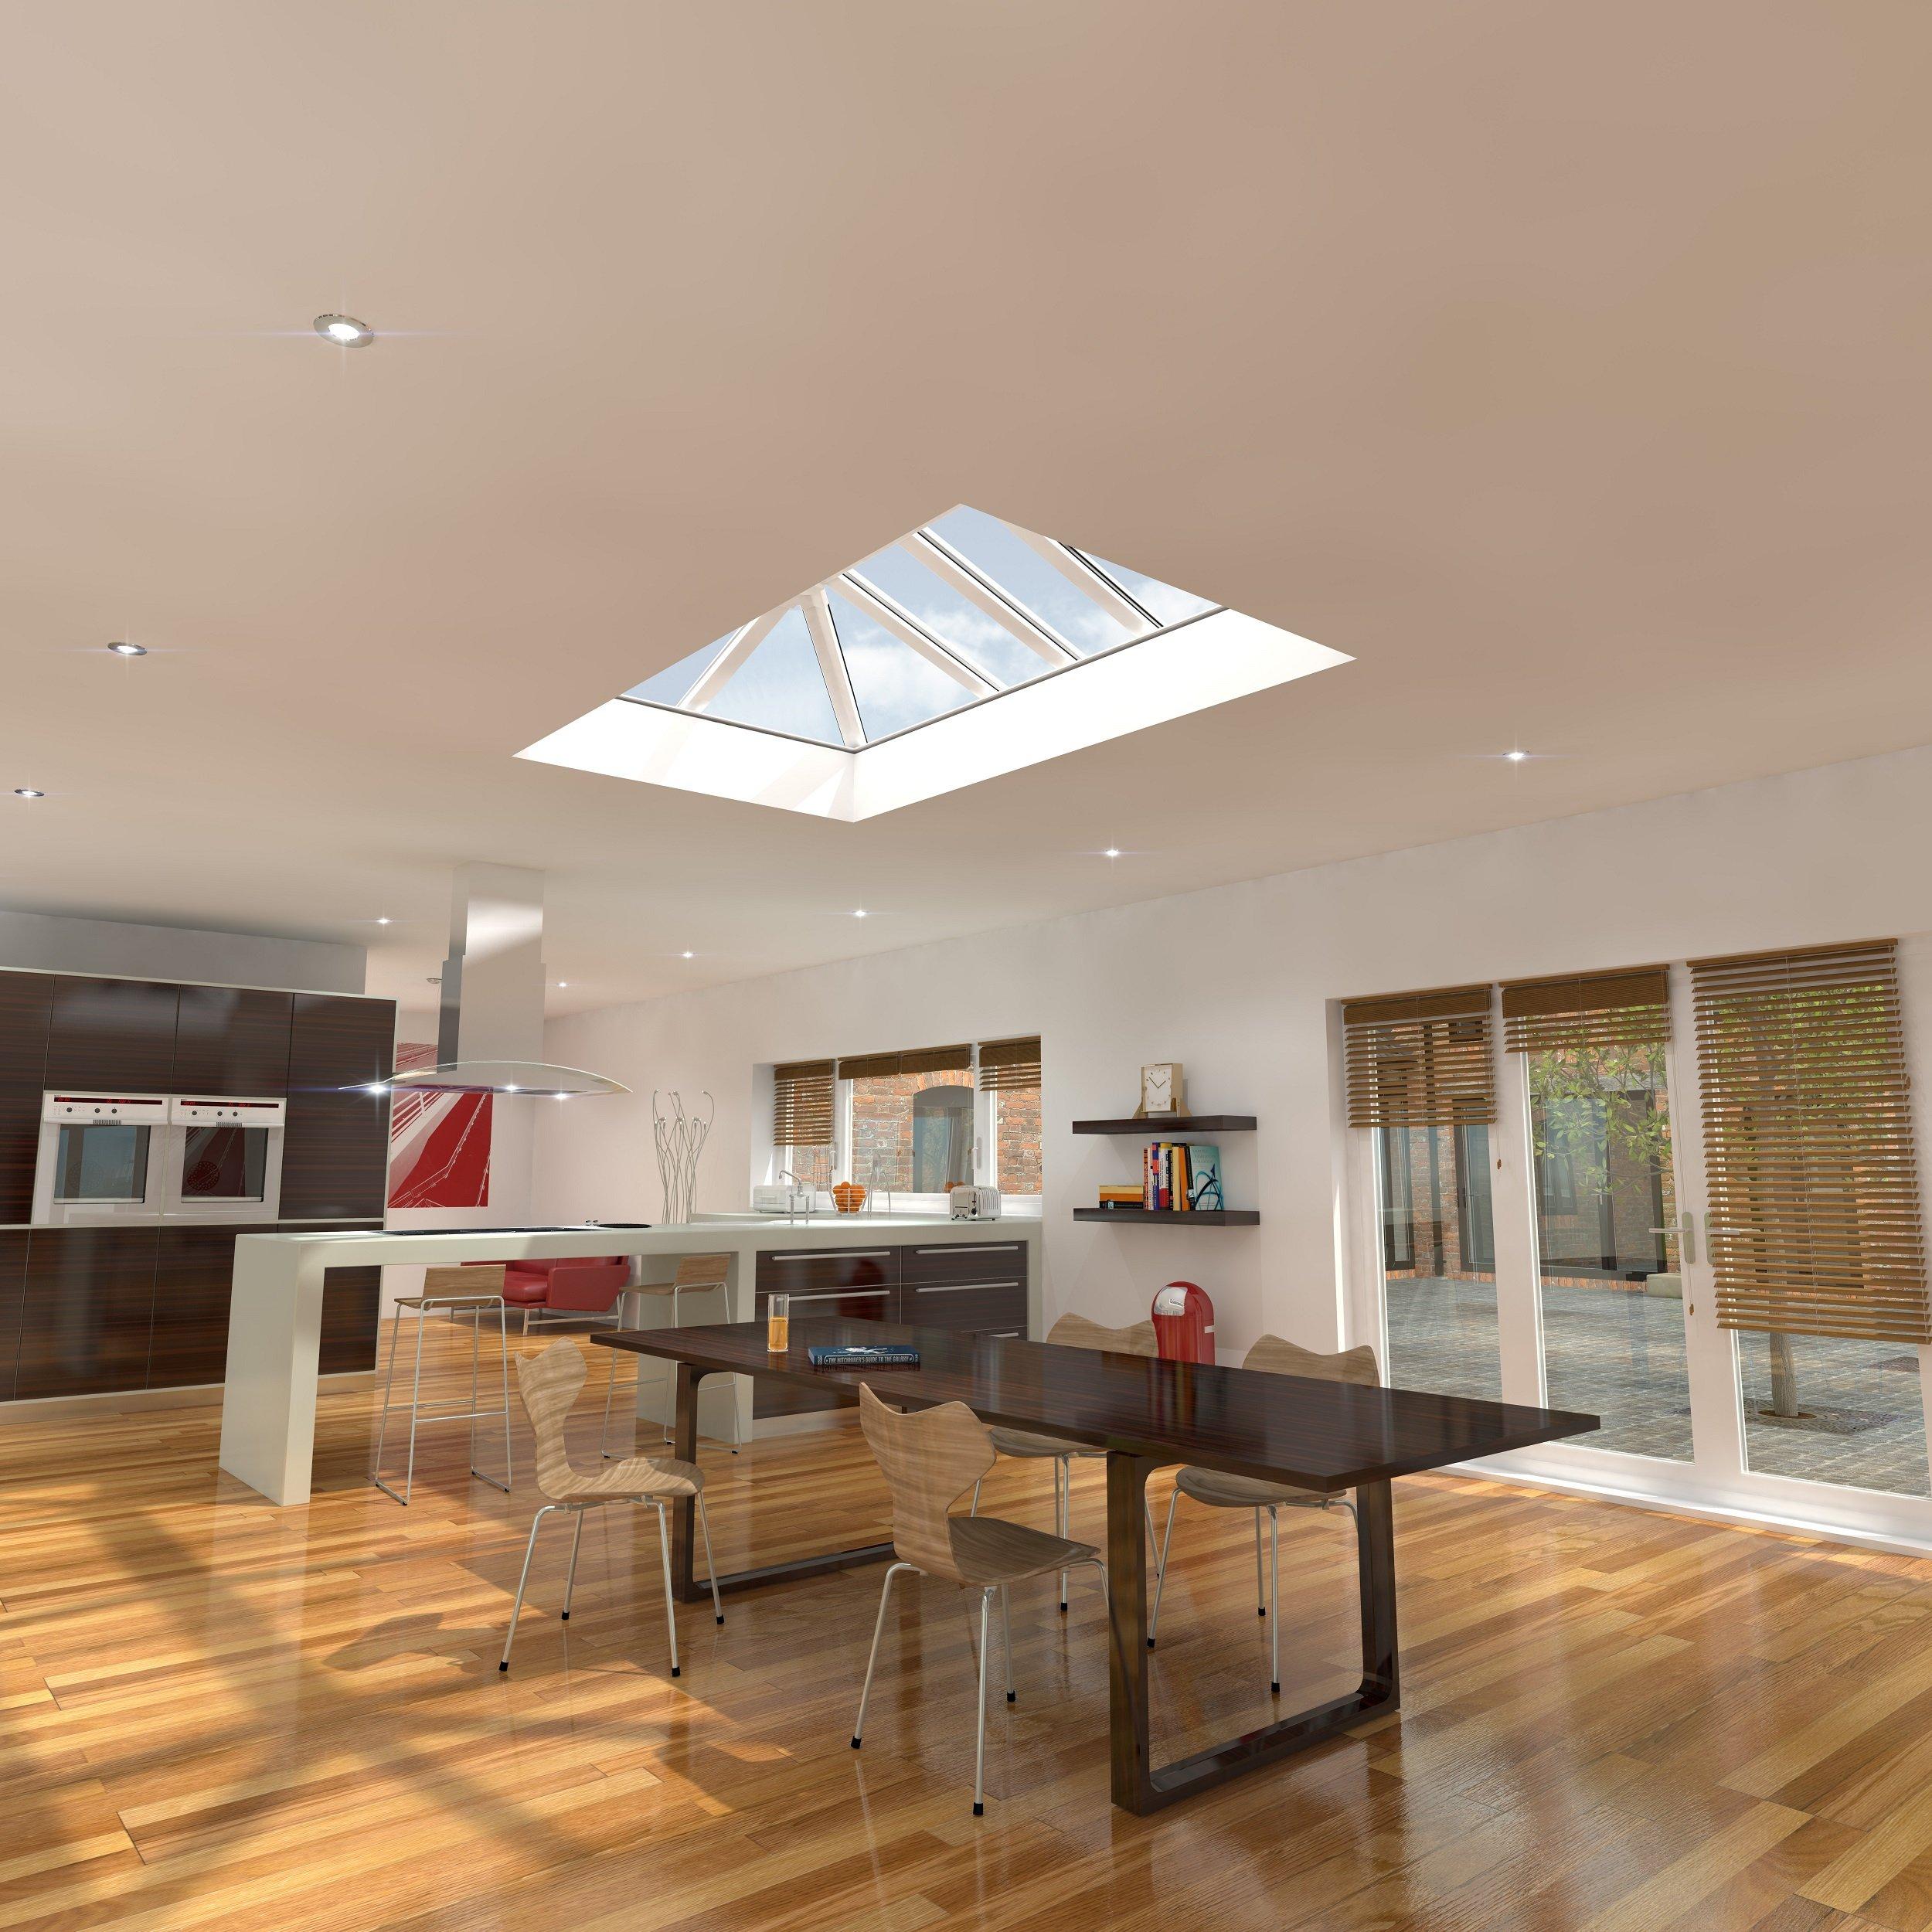 Skypod rooflight Derby Trade Windows